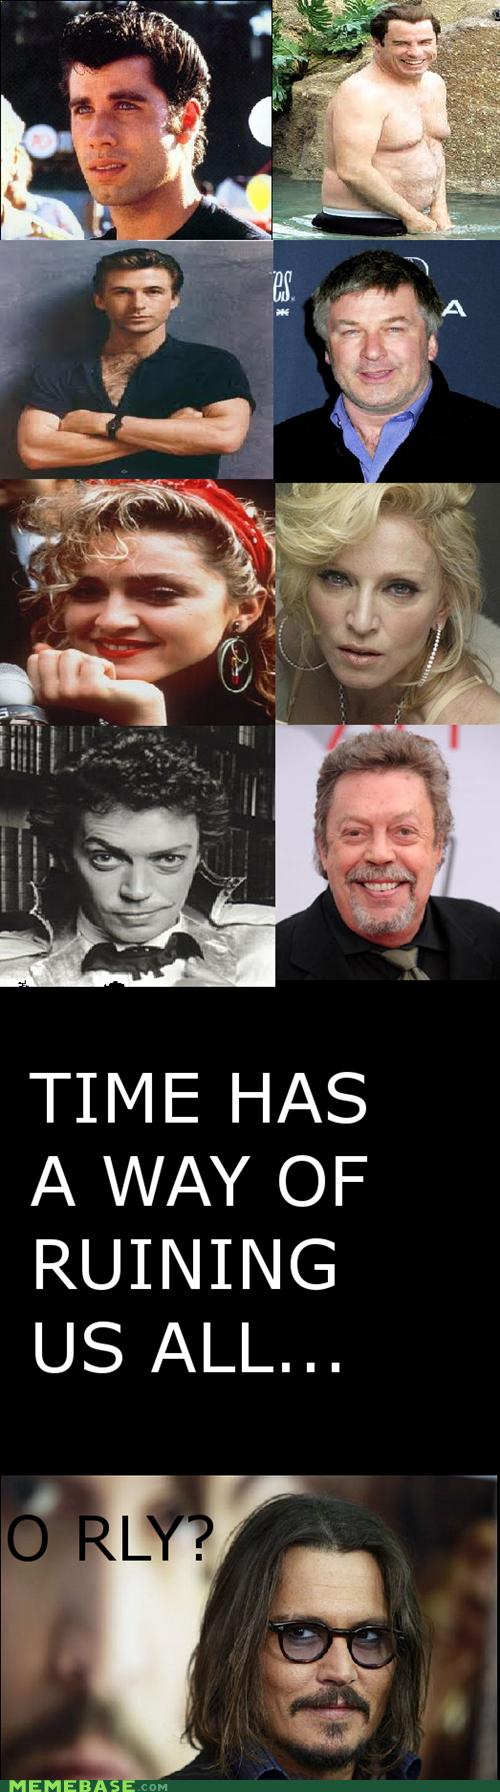 Johnny Depp Memes ruined time - 6434201344